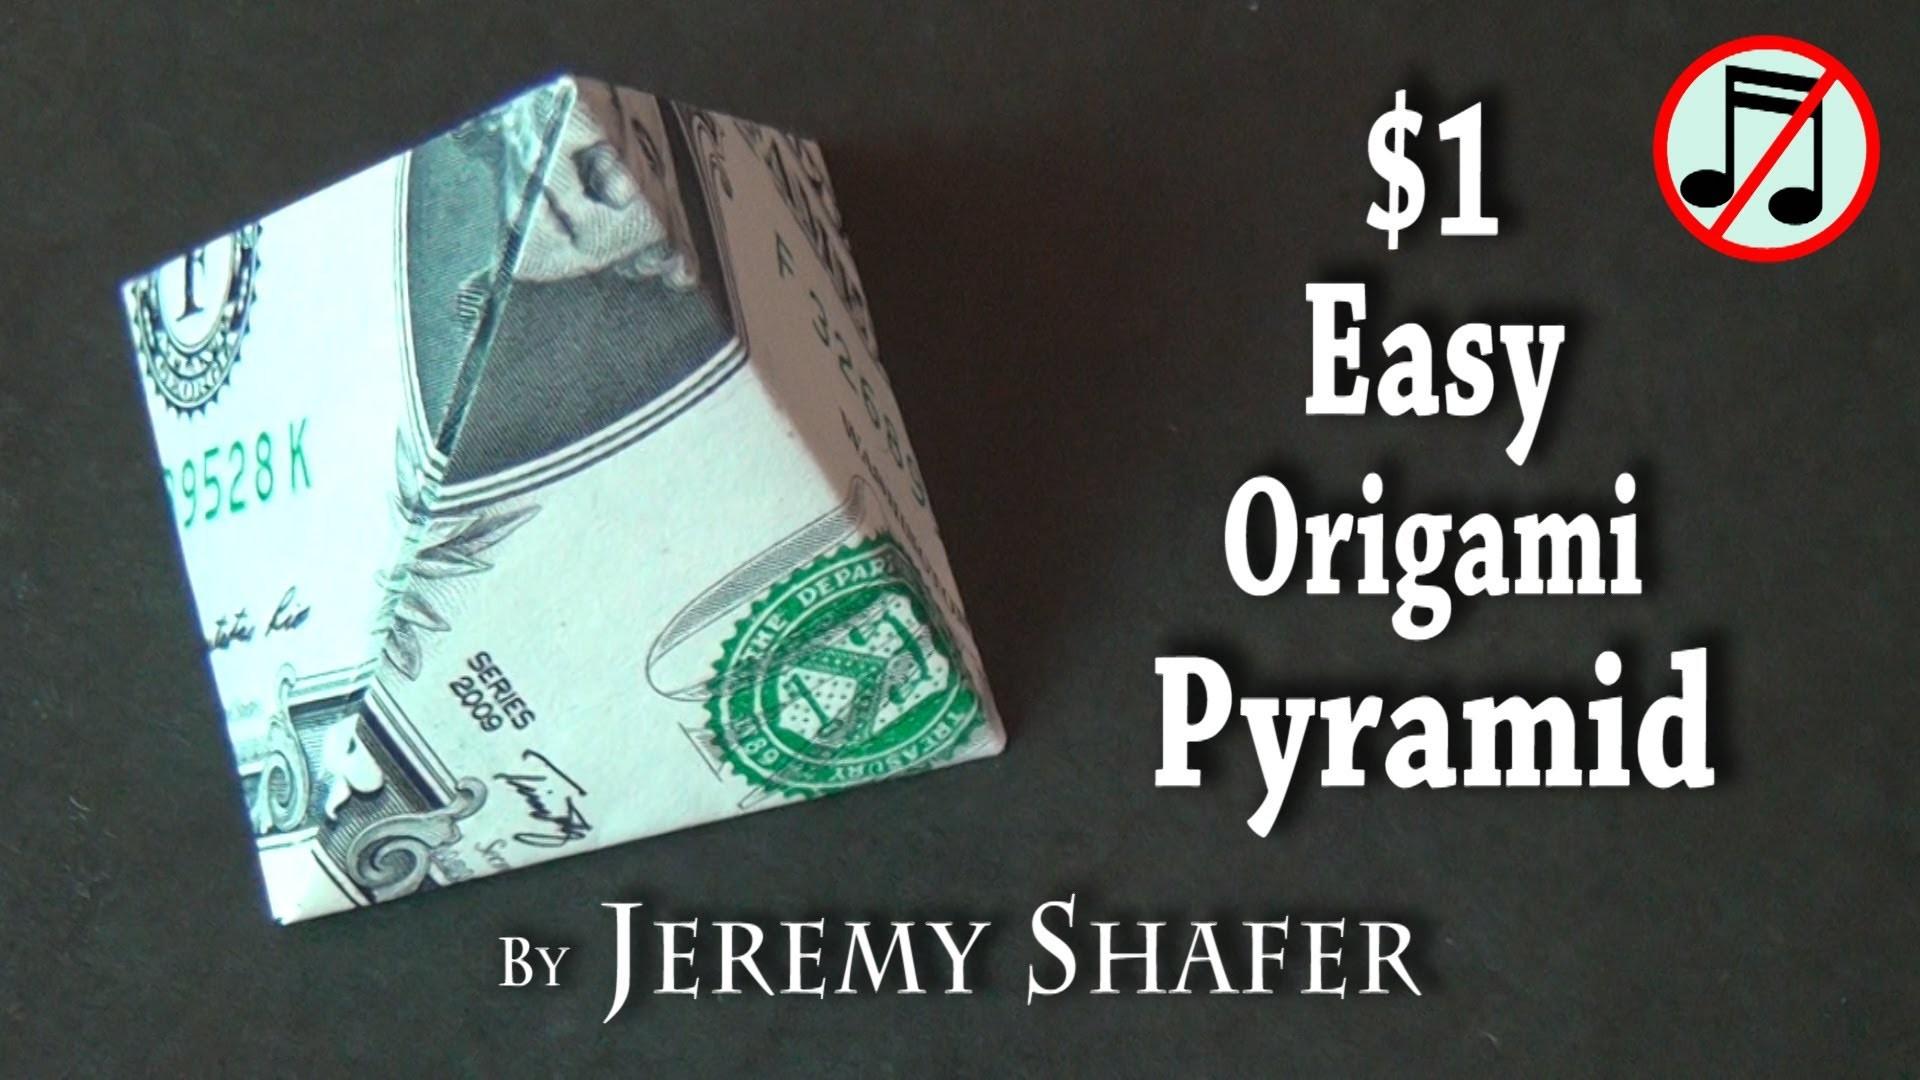 One Dollar Easy Origami Pyramid (no music) - photo#13